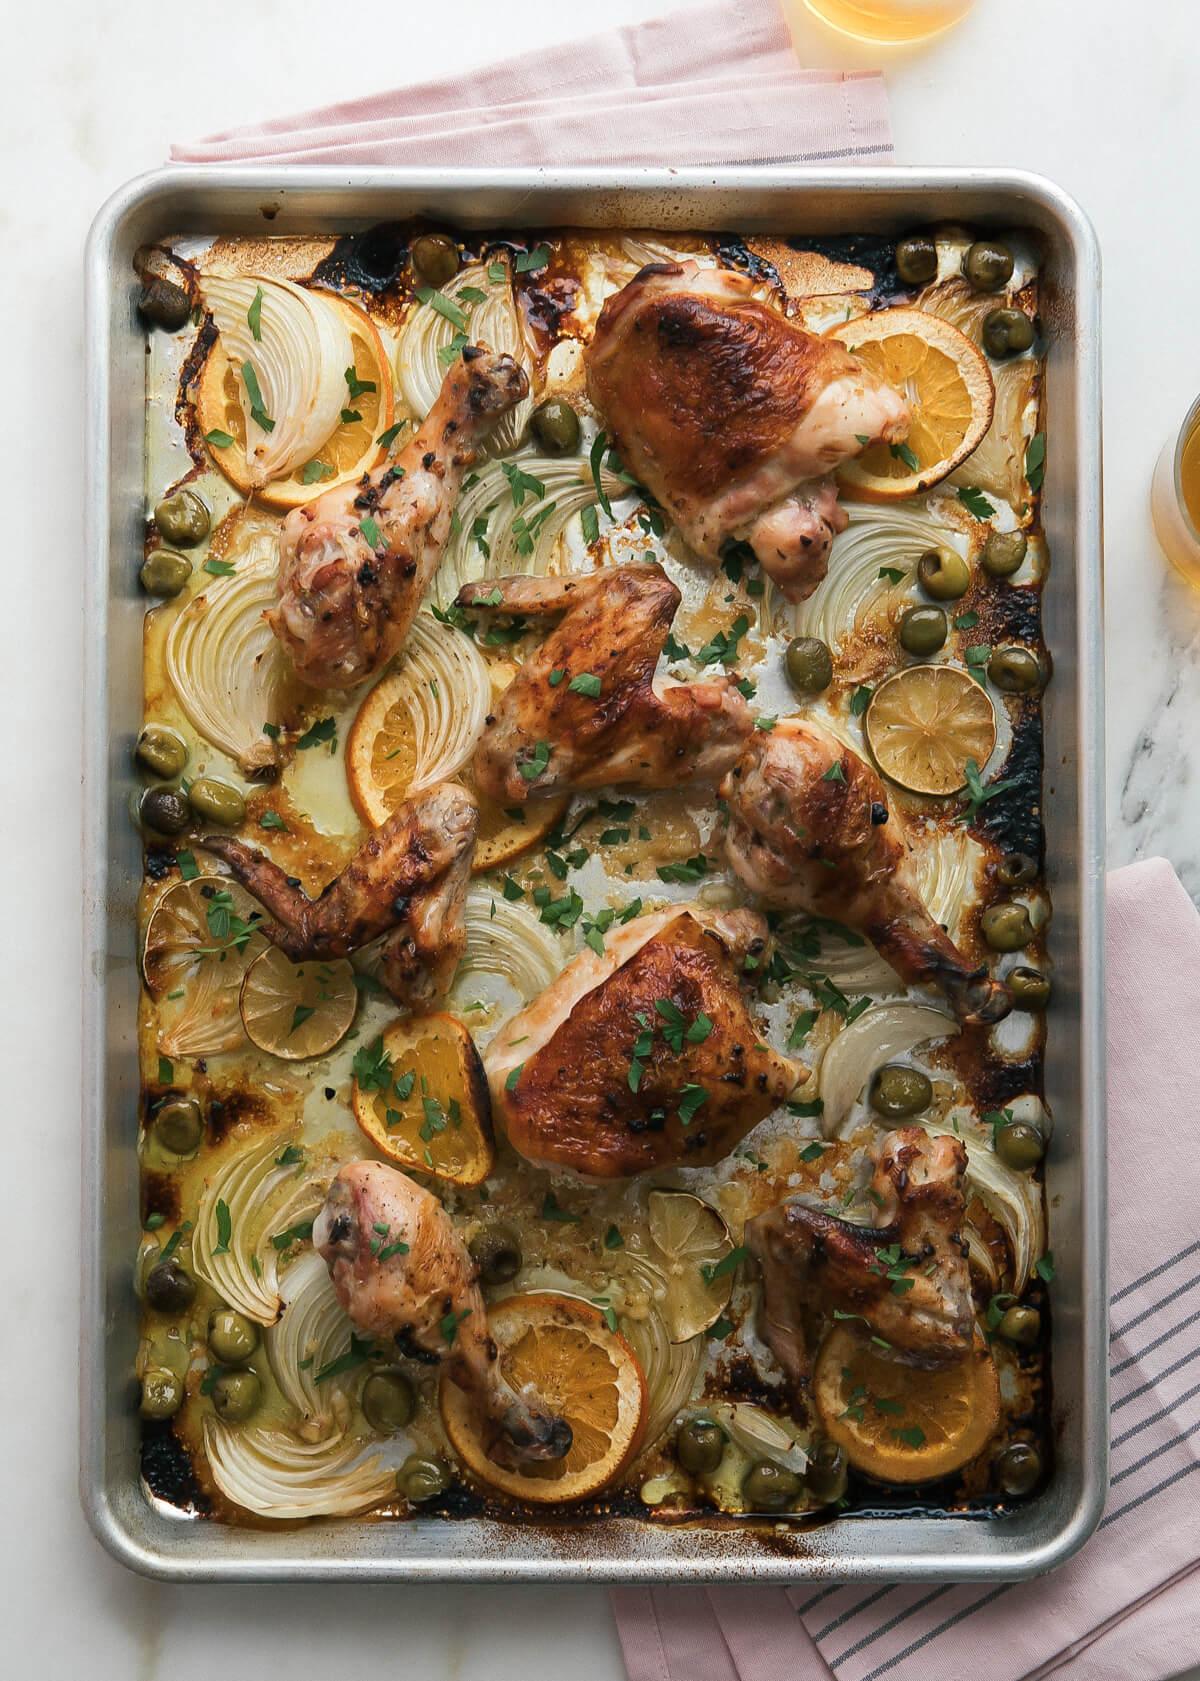 Mojo Sheet Pan Chicken from acozykitchen.com on foodiecrush.com